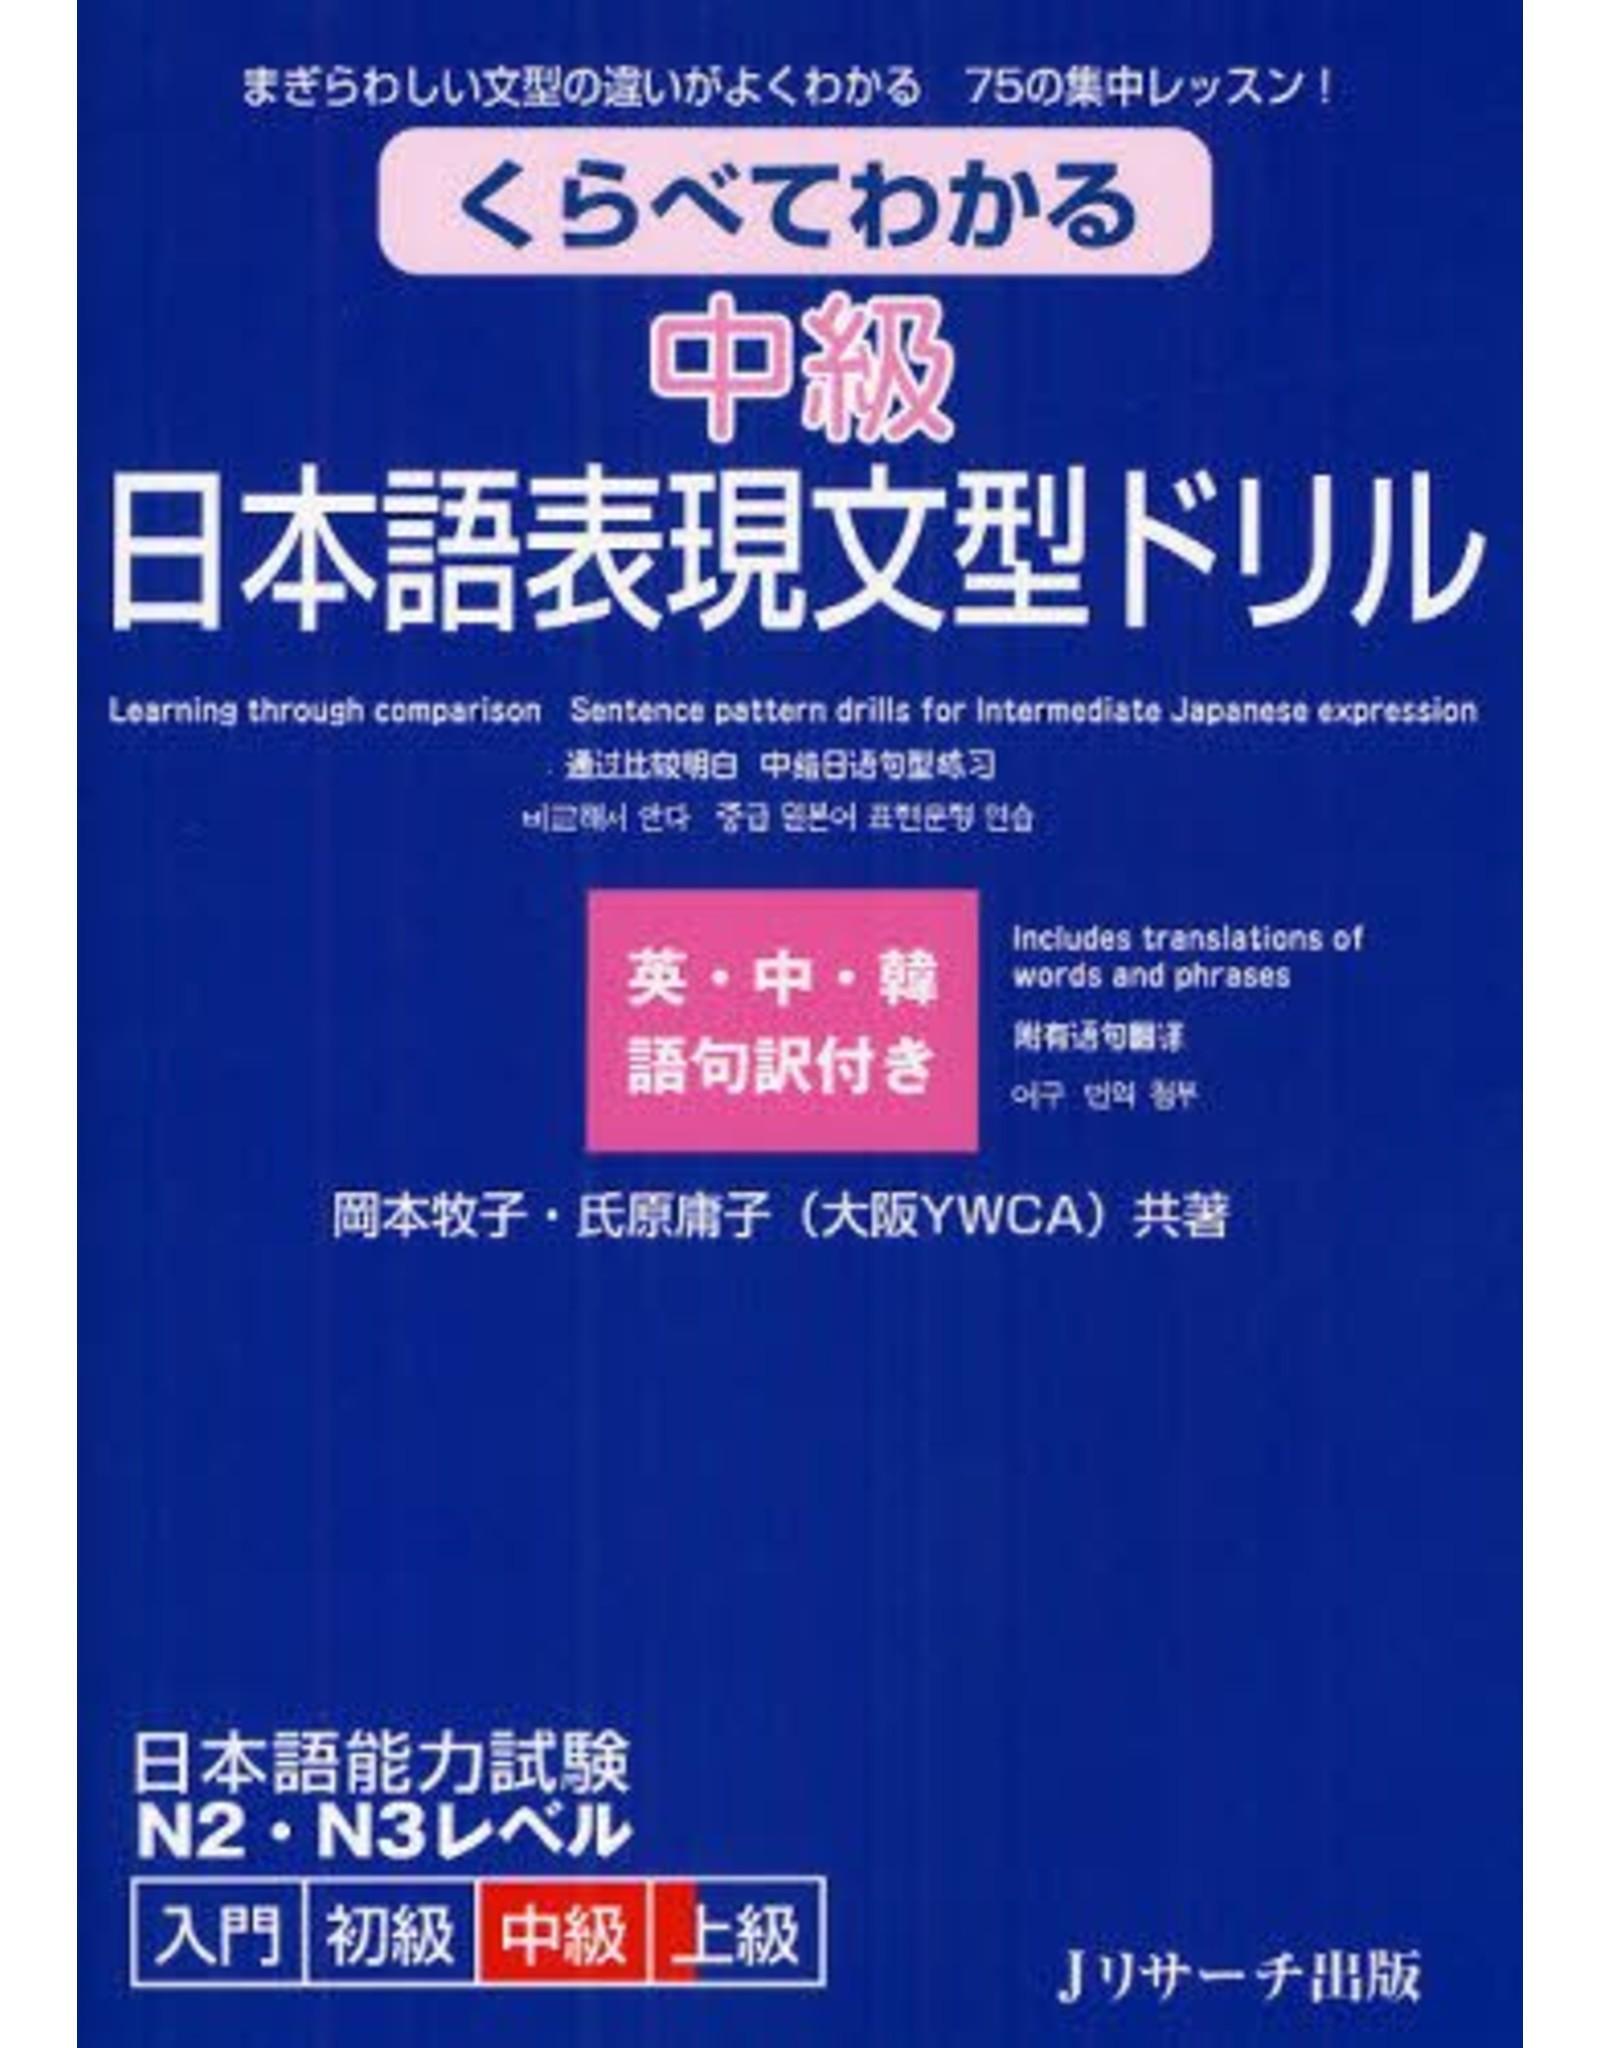 J RESEARCH CHUKYU NIHONGO HYOGEN BUNKEI DRILL : SENTENCE PATTERN DRILLS FOR INTERMEDIATE J EXPRESSION